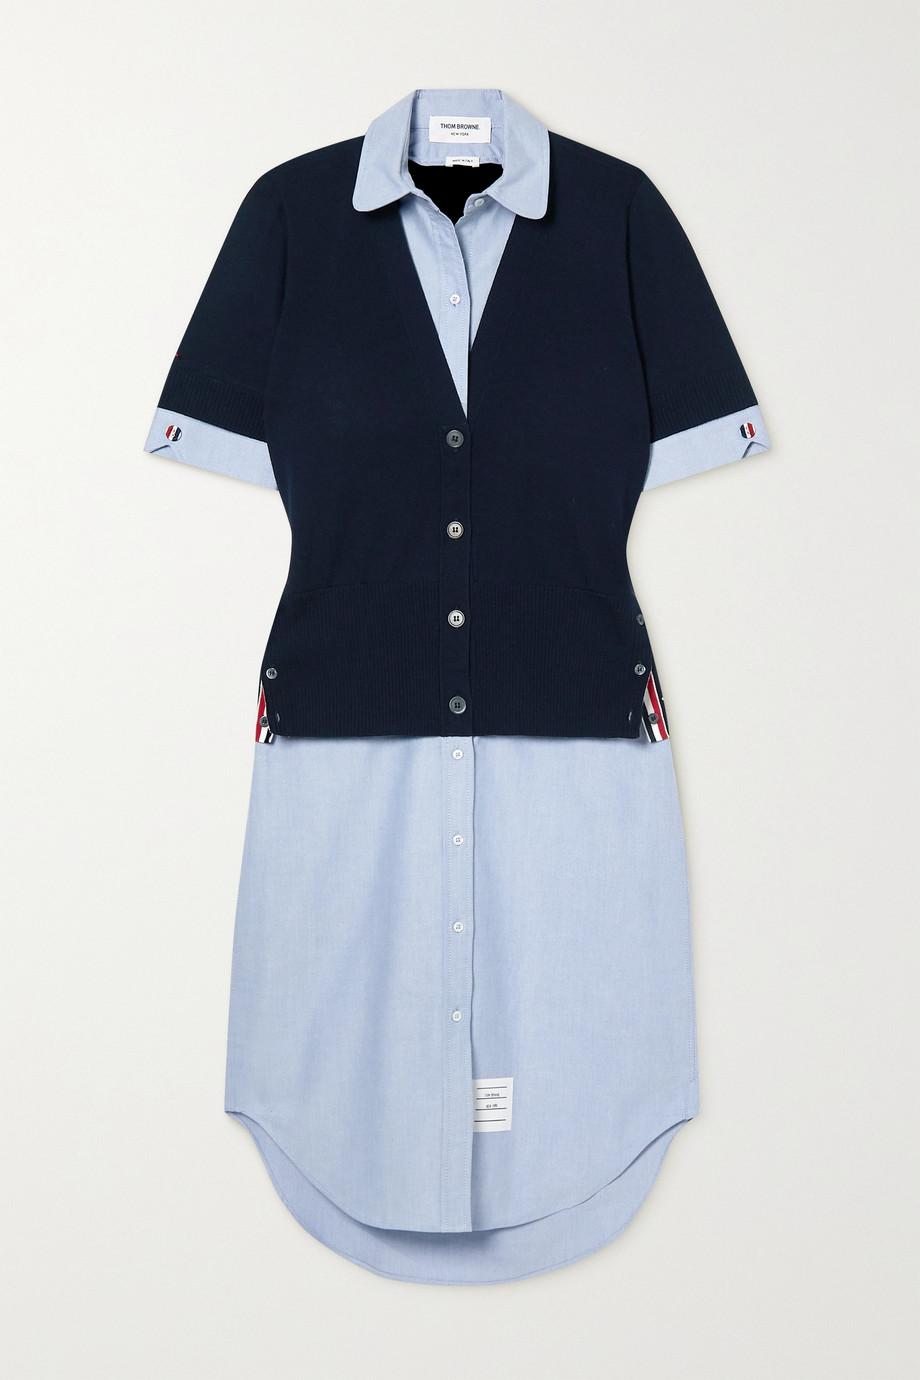 Thom Browne Grosgrain-trimmed merino wool and cotton-poplin shirt dress